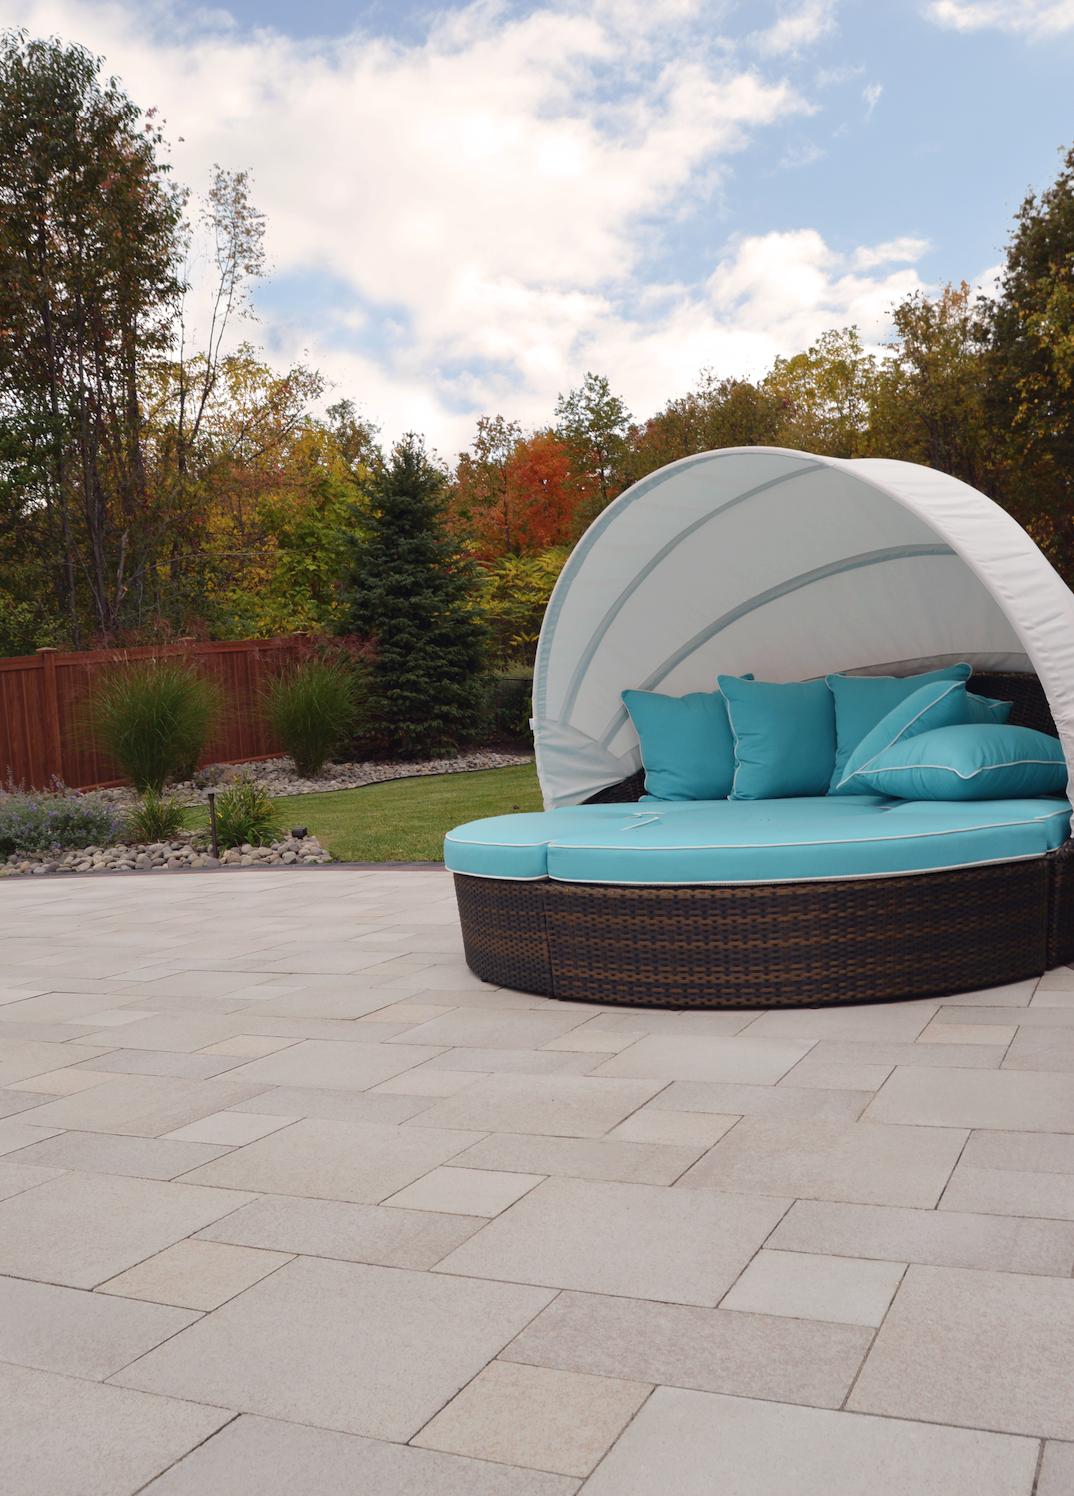 Landscape design in orange county, ny | backyard landscape ideas NY